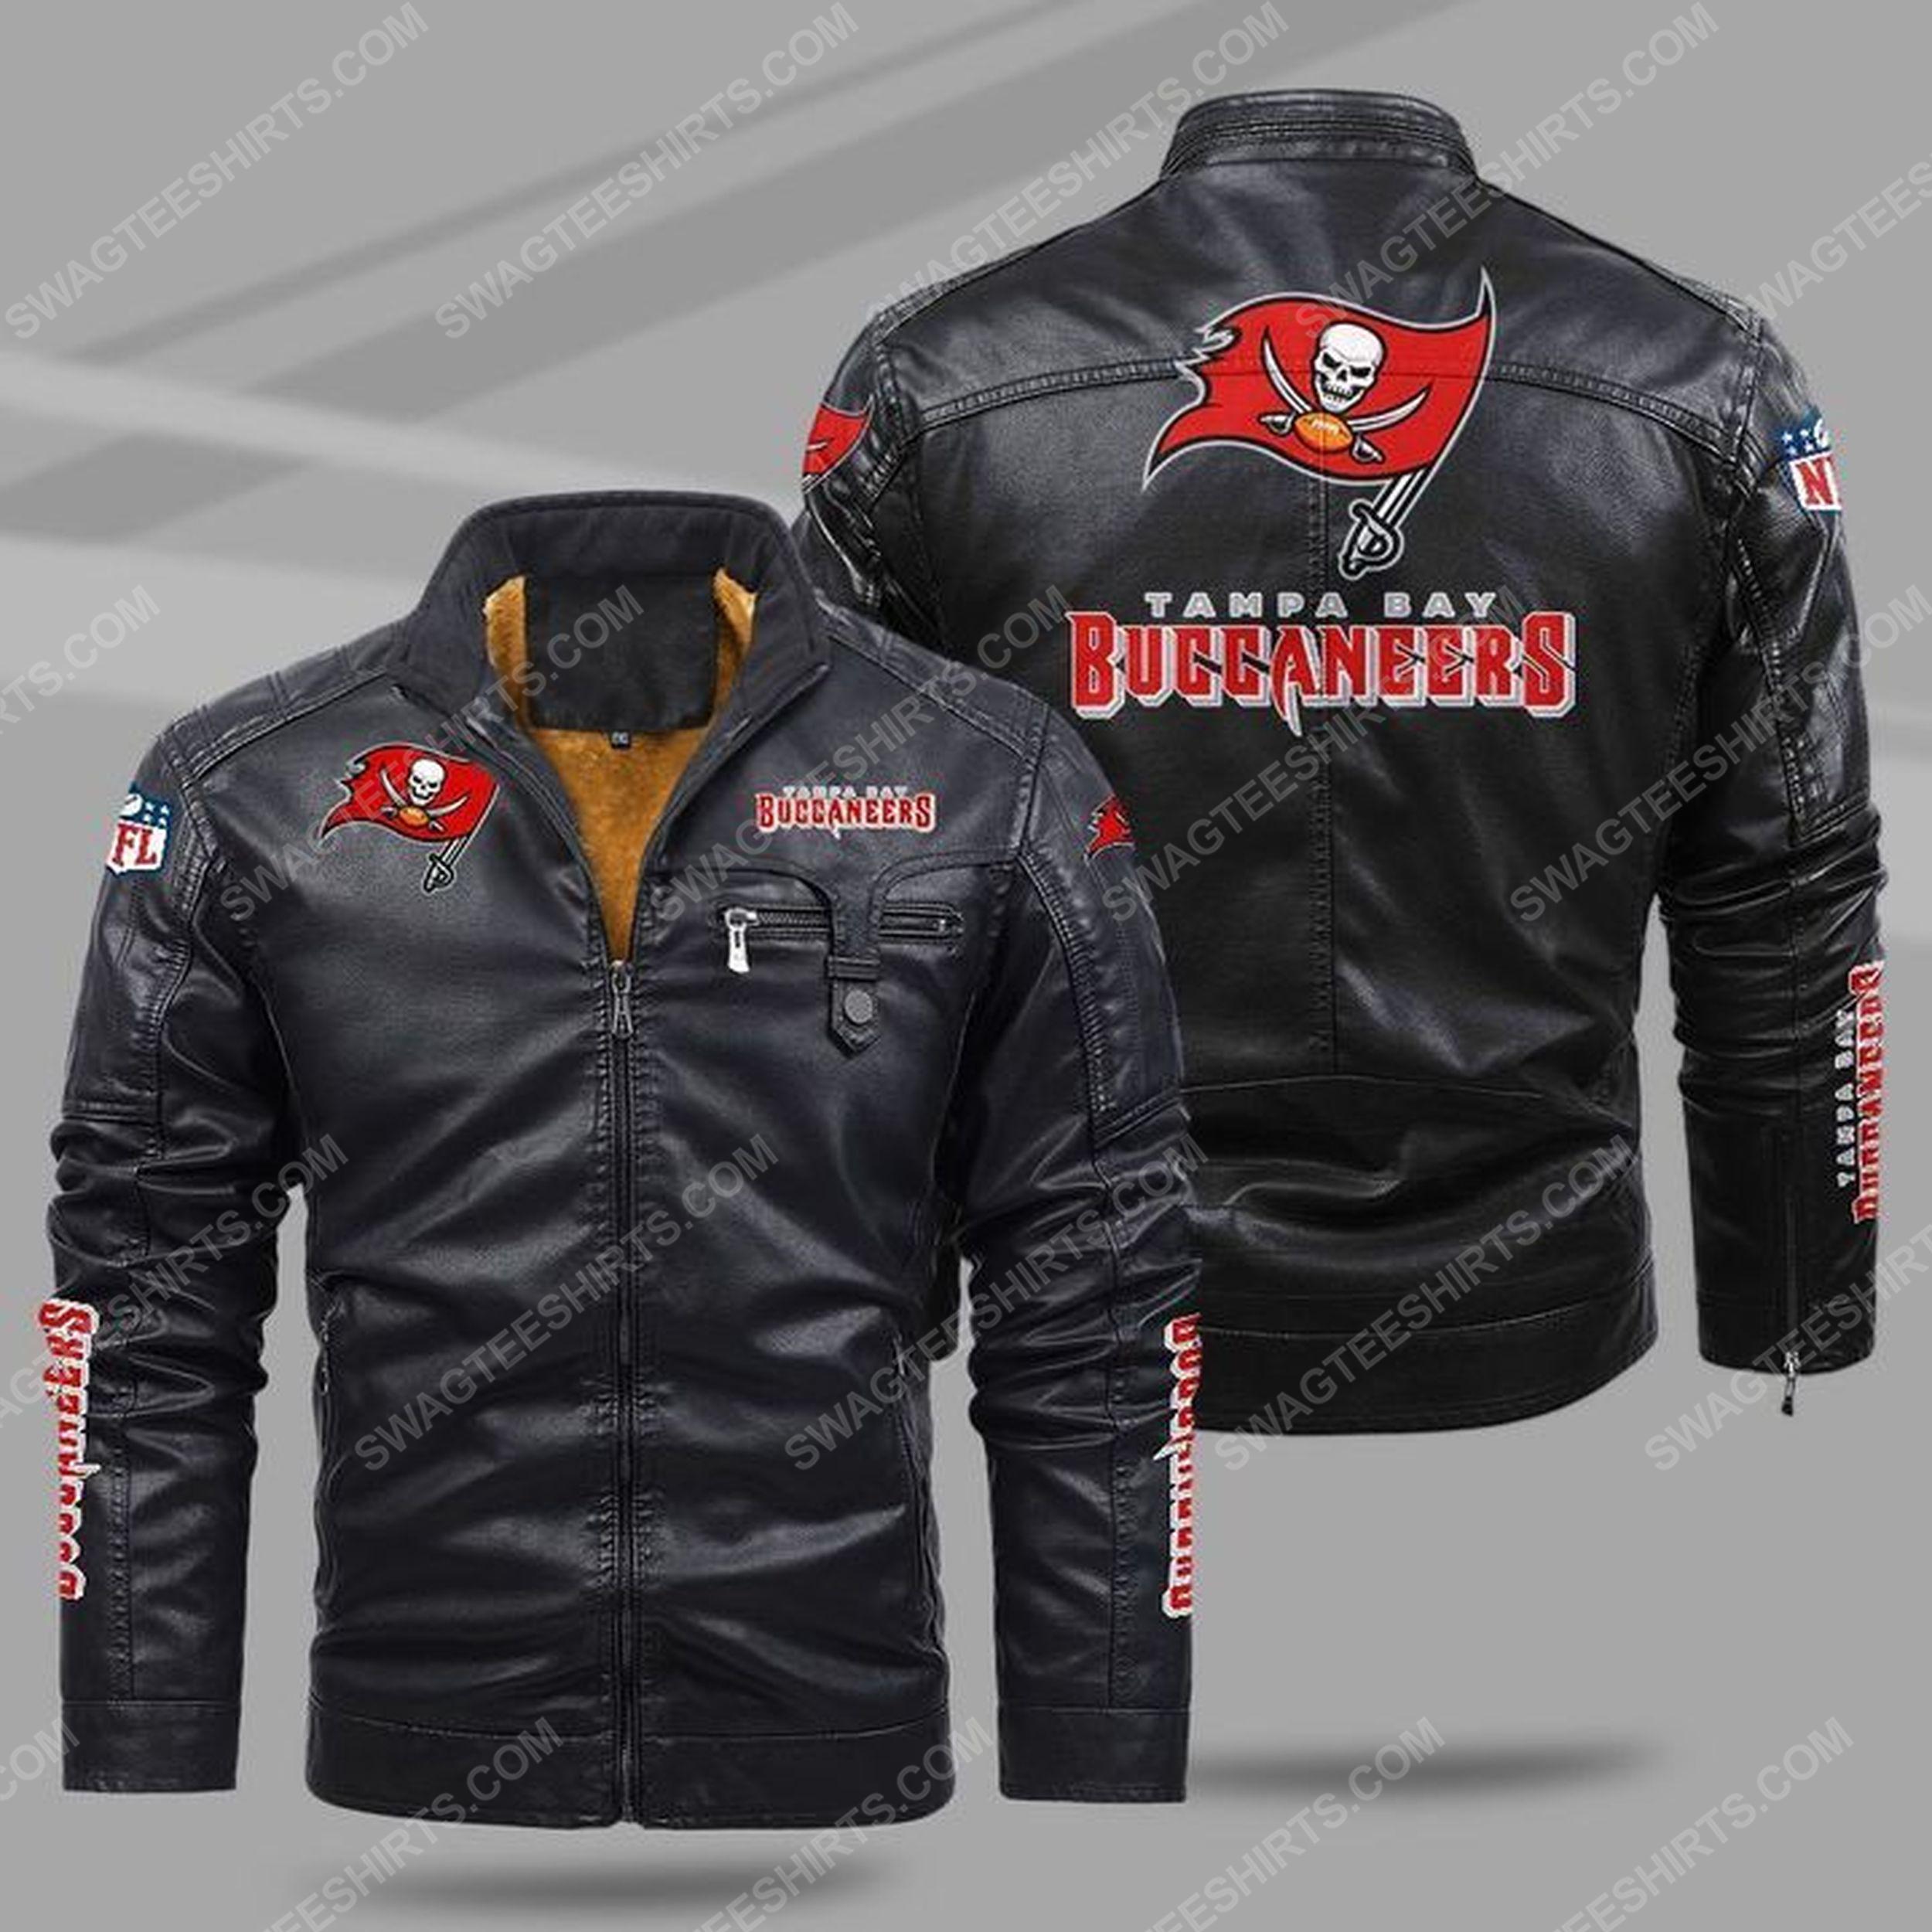 The tampa bay buccaneers nfl all over print fleece leather jacket - black 1